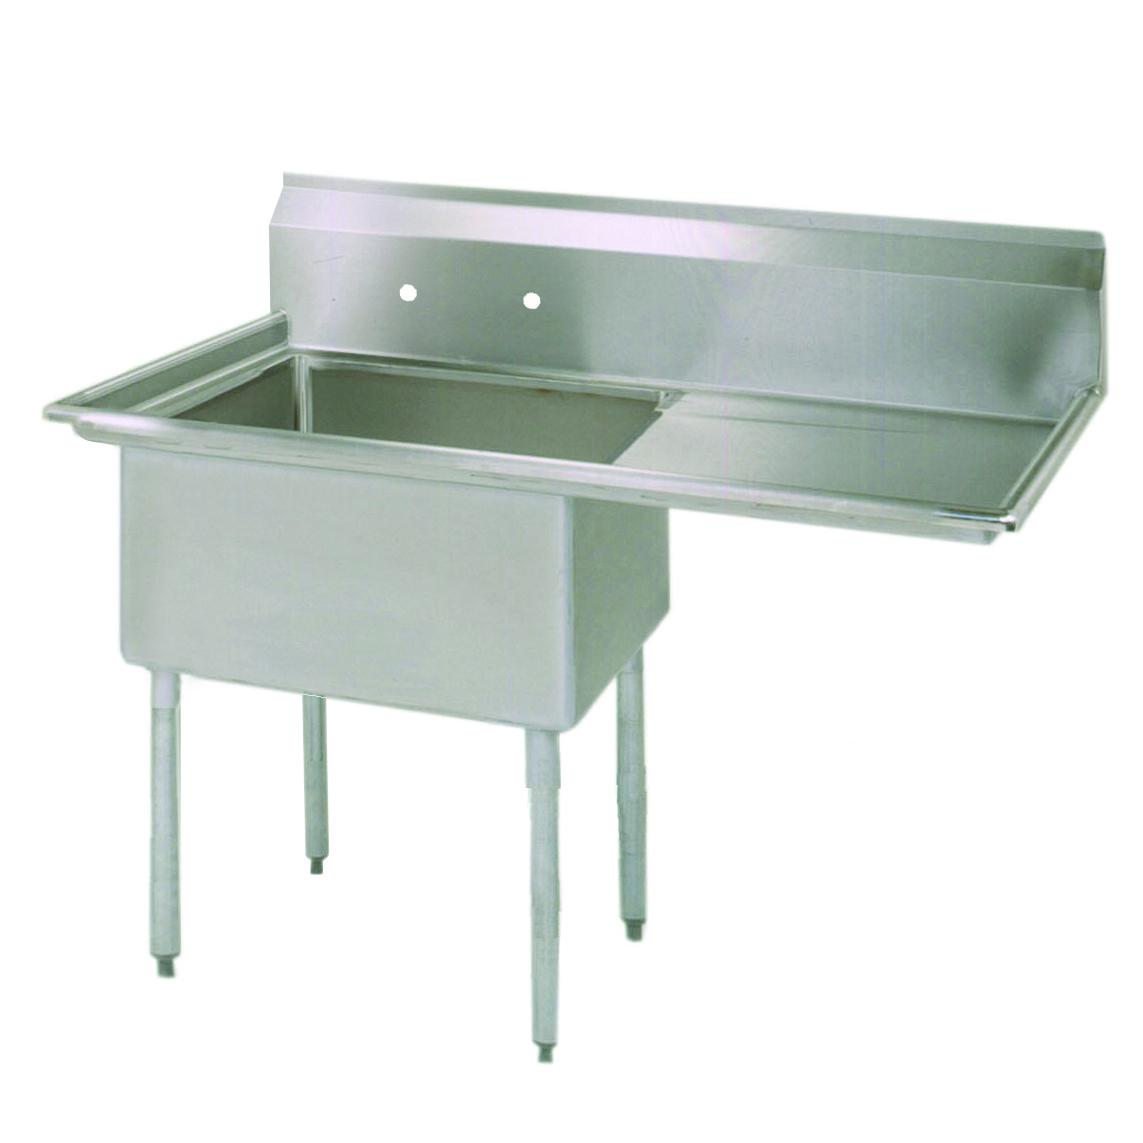 BK Resources ES-1-18-12-18R sink, (1) one compartment